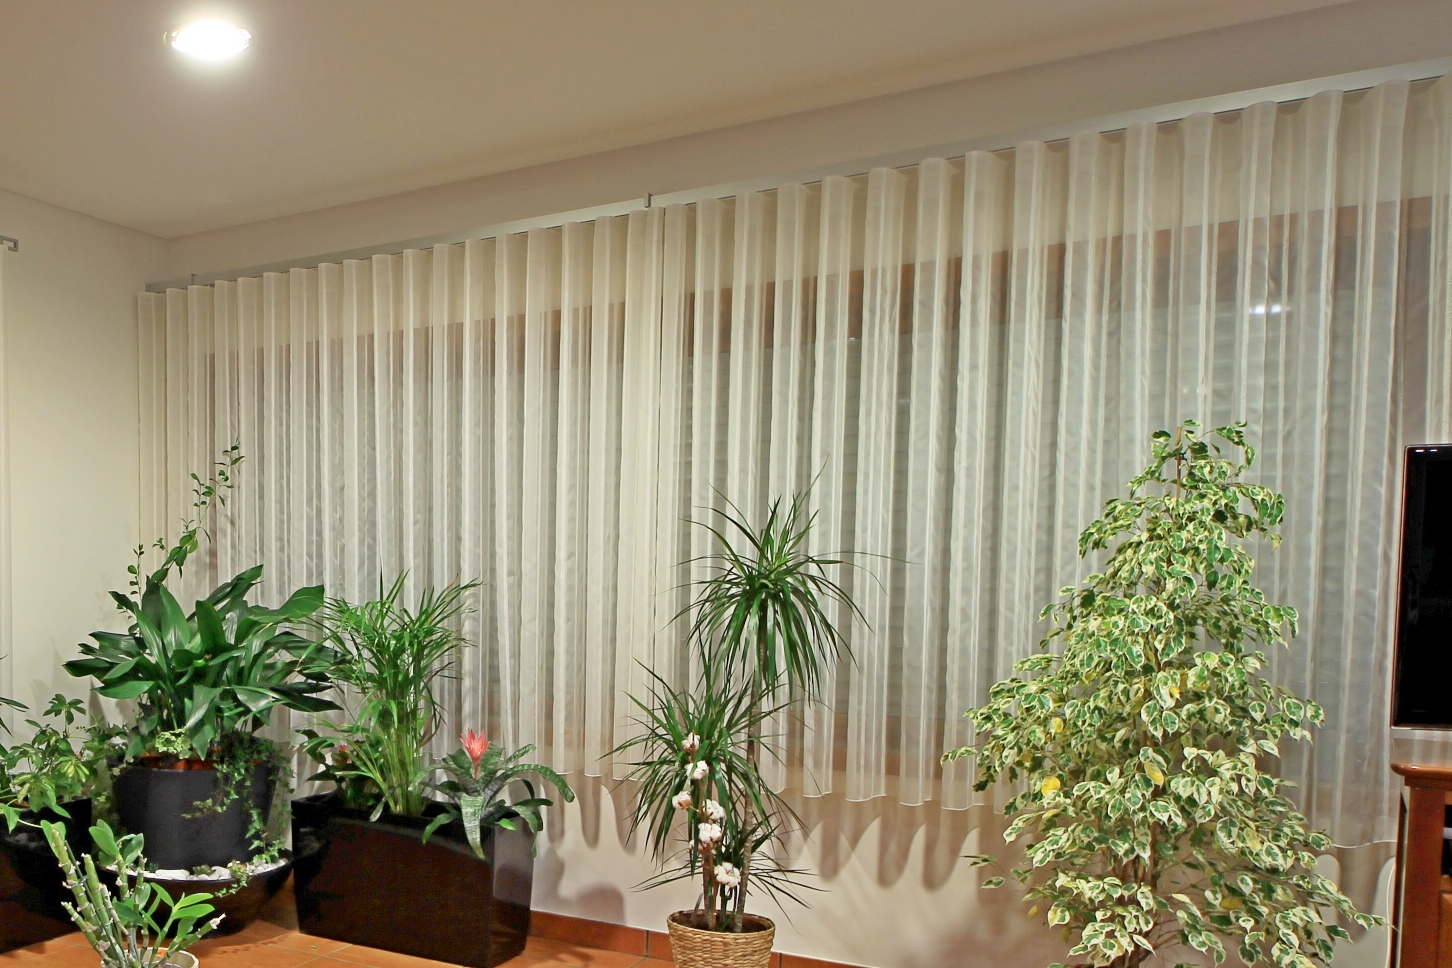 Cortinados modernos finest interesting cortinas tandil with cortinados modernos with cortinados - Cortinados modernos ...